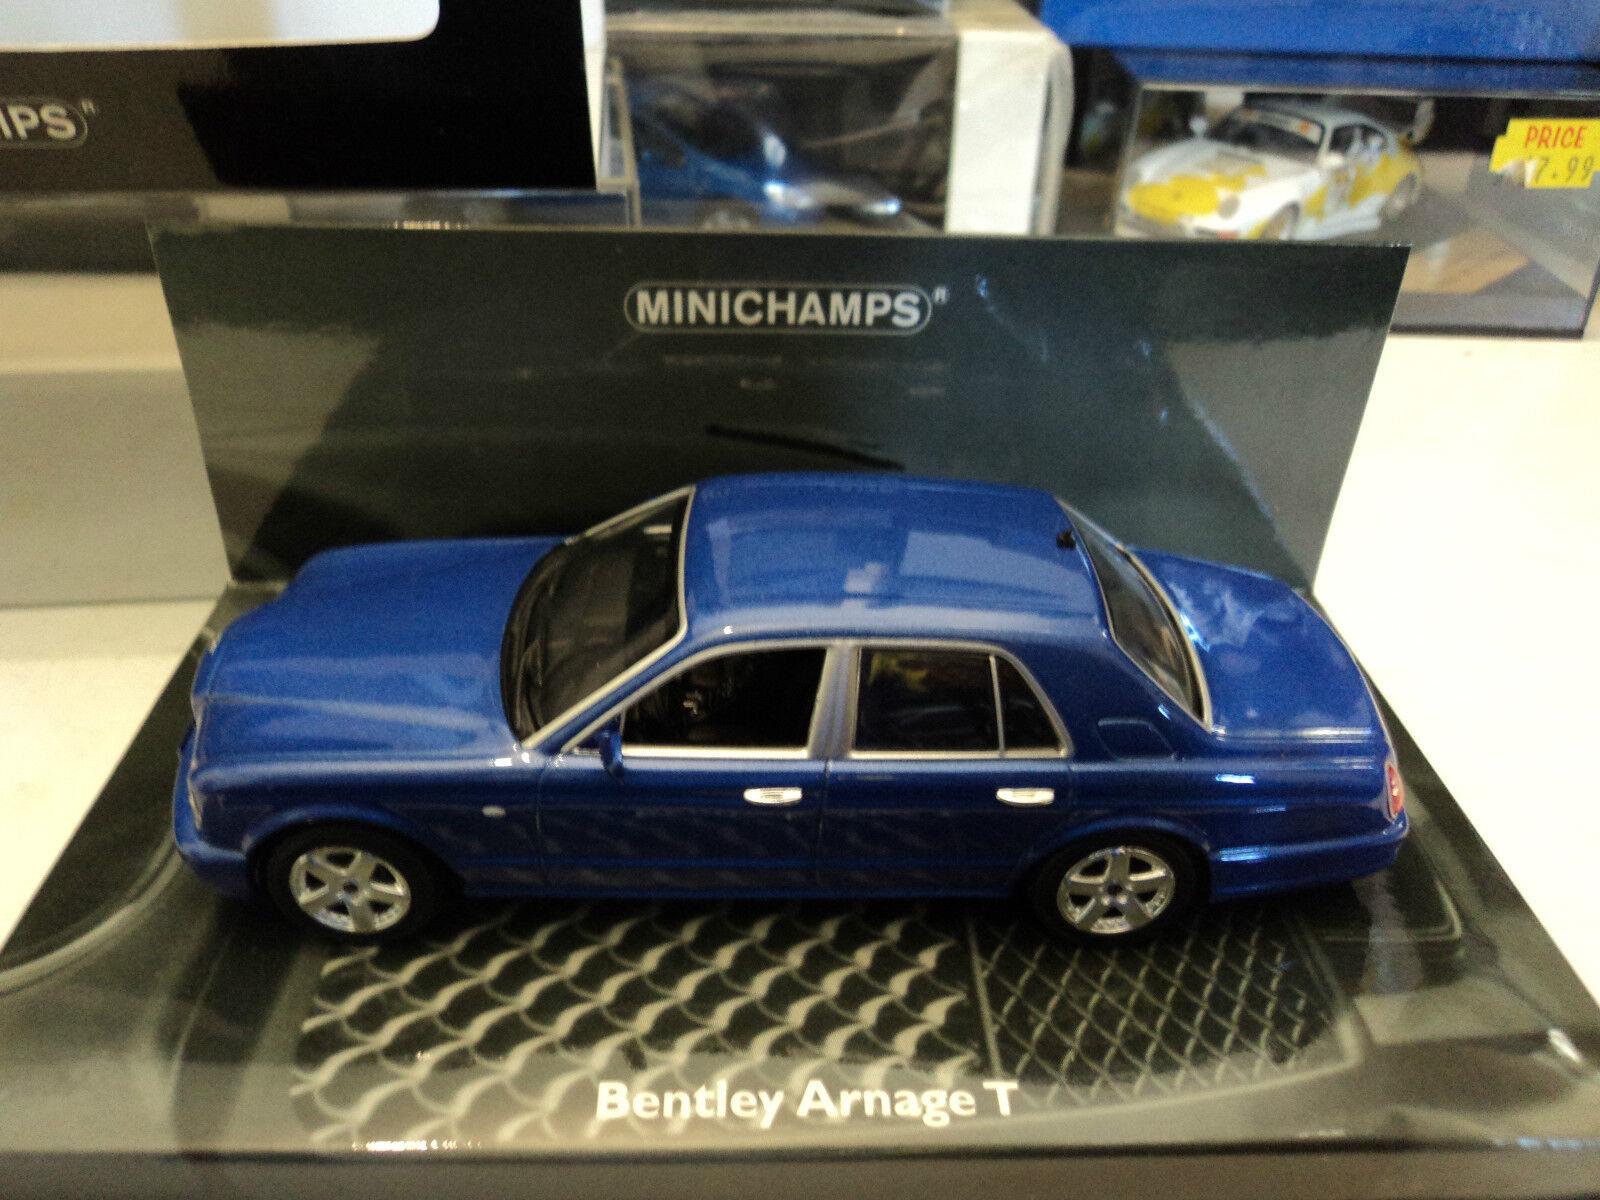 bienvenido a orden Minichamps 1 1 1 43 Bentley Arnage T azul metallic  conveniente